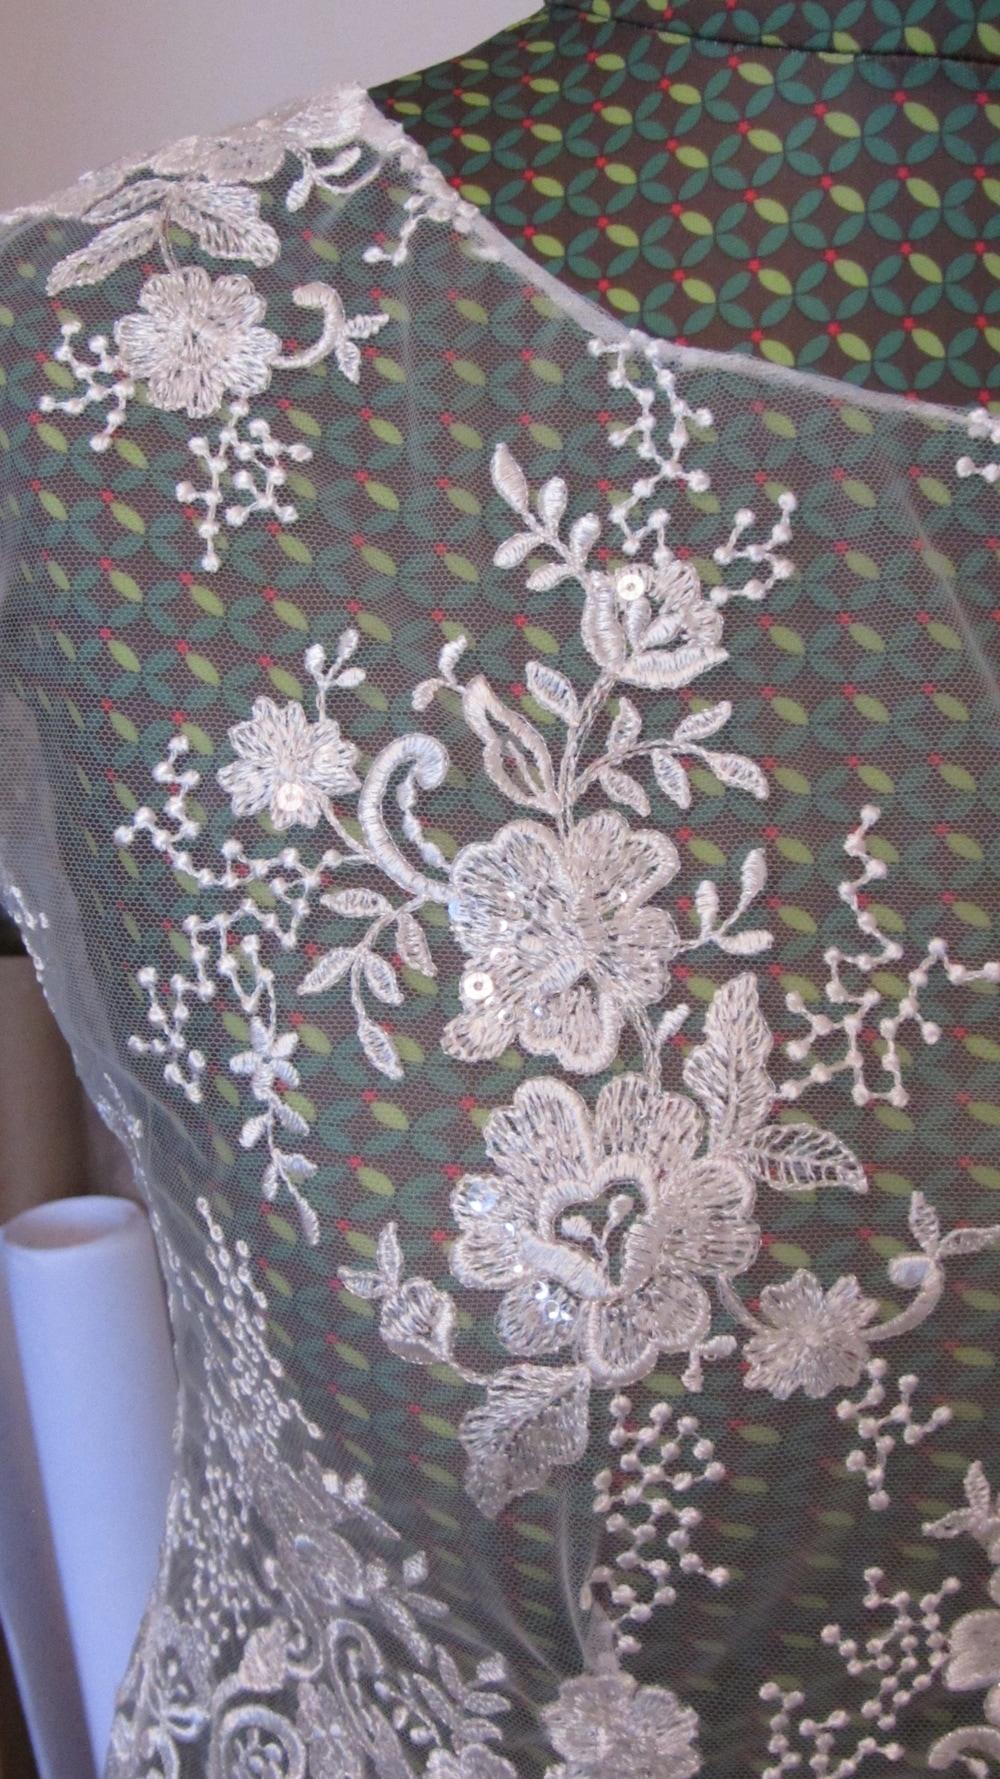 Handmade wedding dress shelley lace bodice applique lace neck line 2.jpg